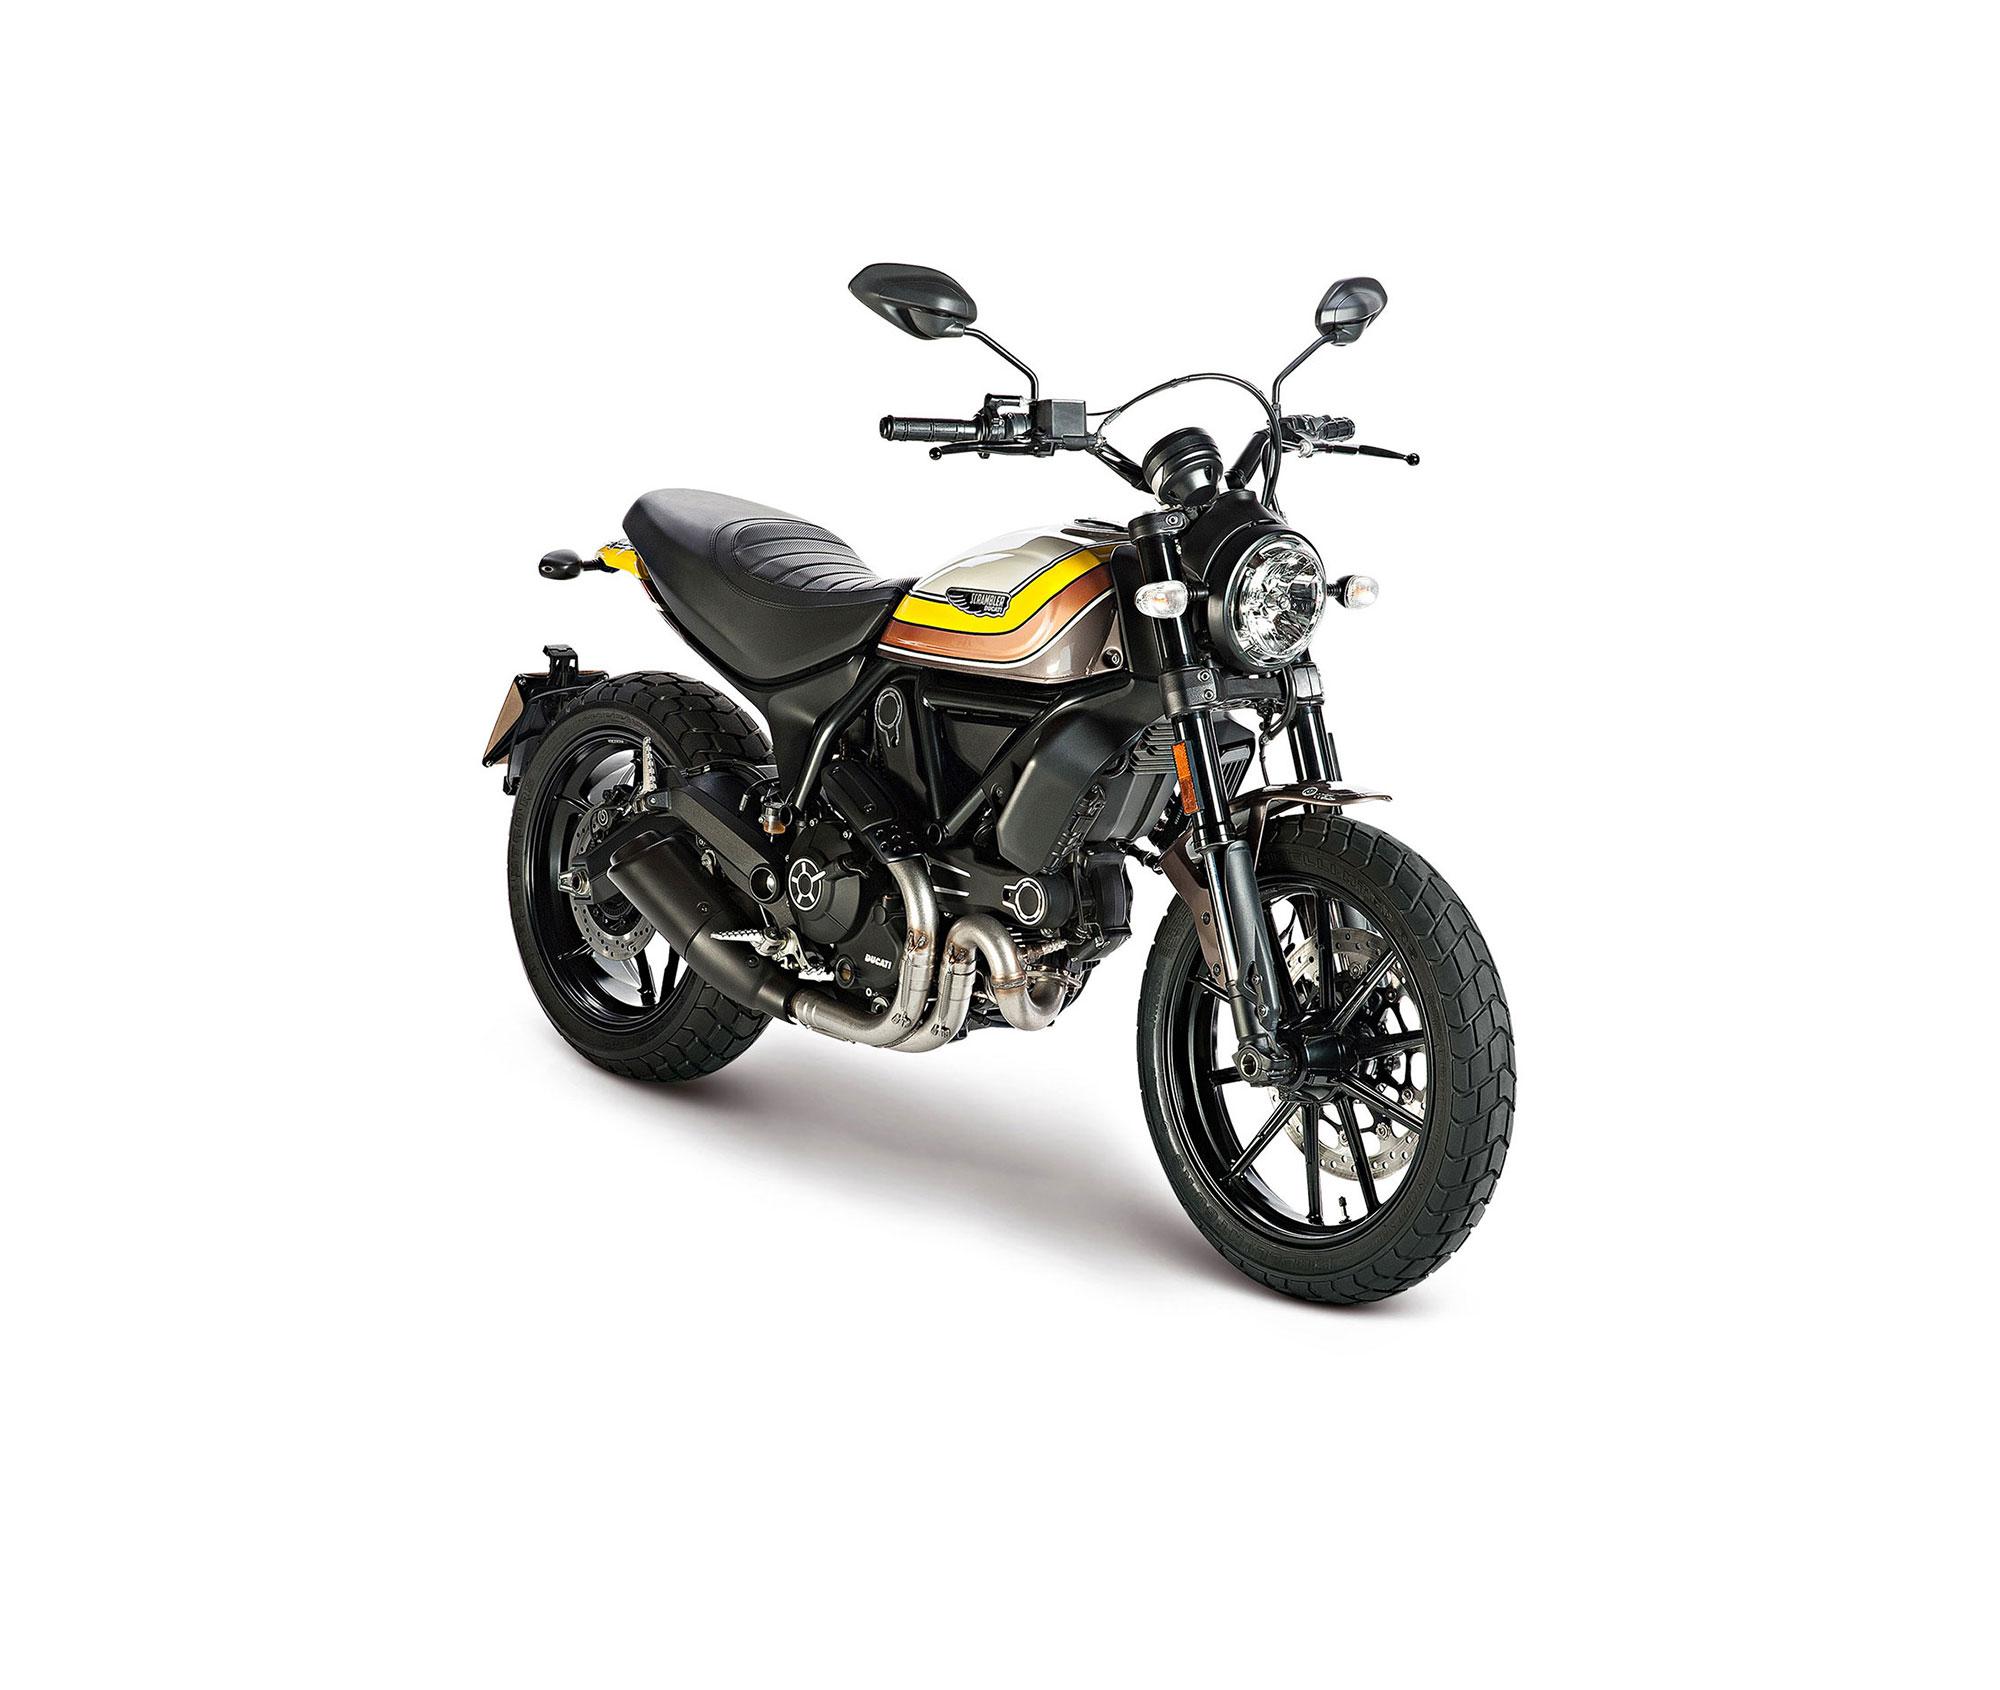 МОТОЦИКЛ DUCATI SCRAMBLER MACH 2.0 ― Артмото - купить квадроцикл в украине и харькове, мотоцикл, снегоход, скутер, мопед, электромобиль